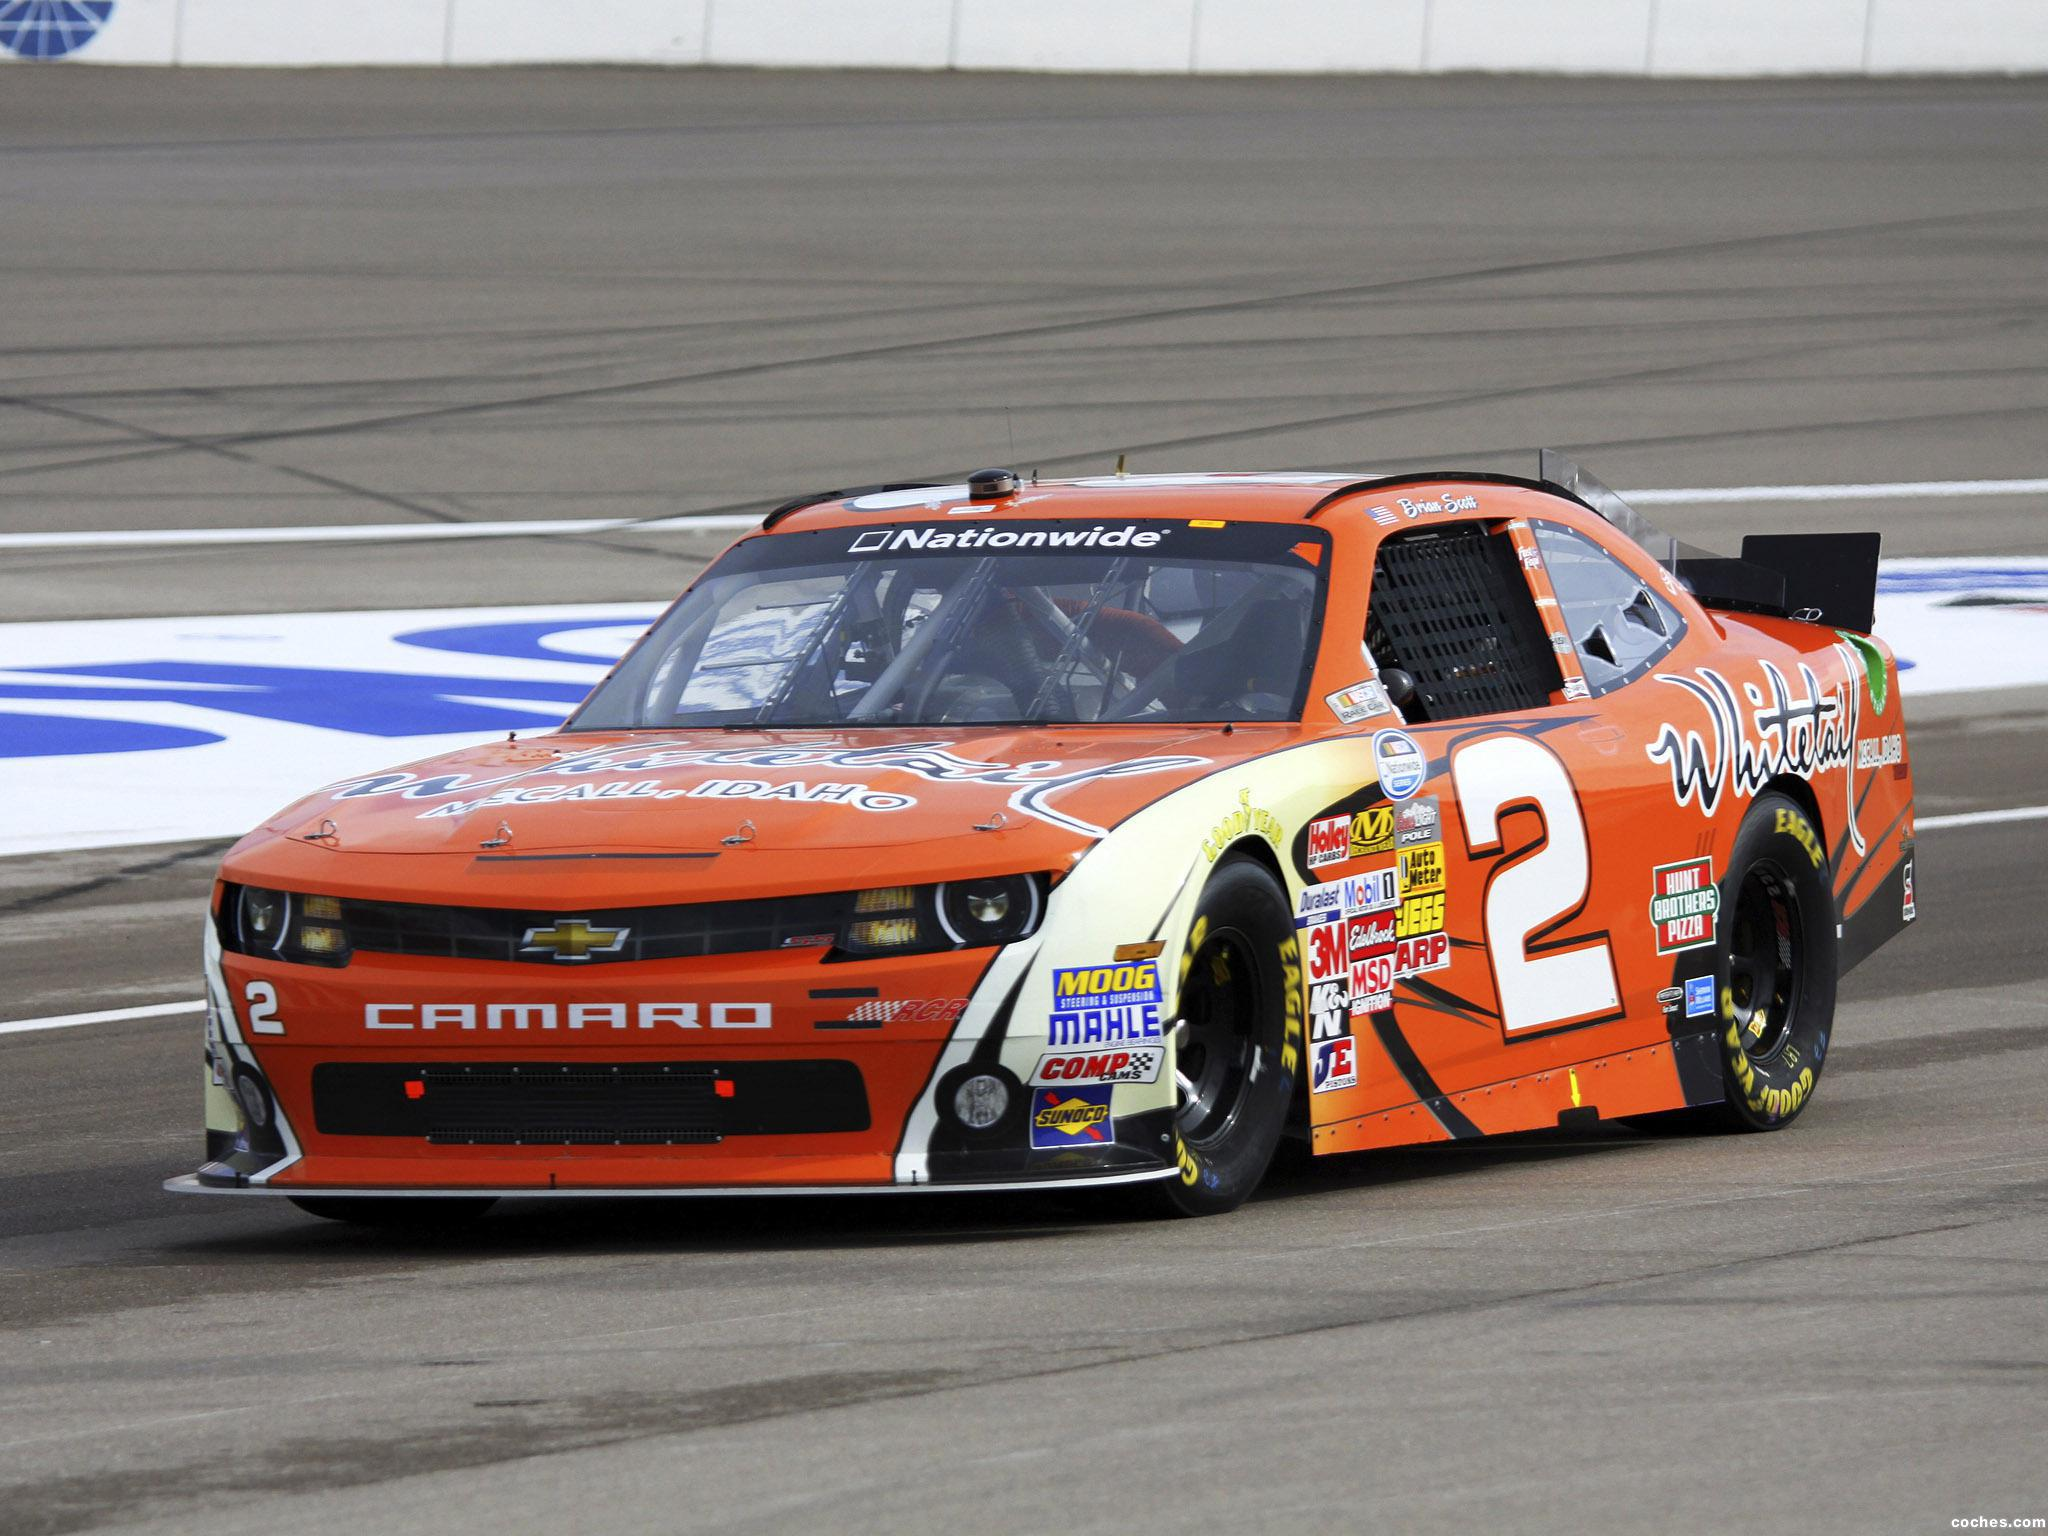 Foto 0 de Chevrolet Camaro NASCAR Nationwide Series Race Car 2013